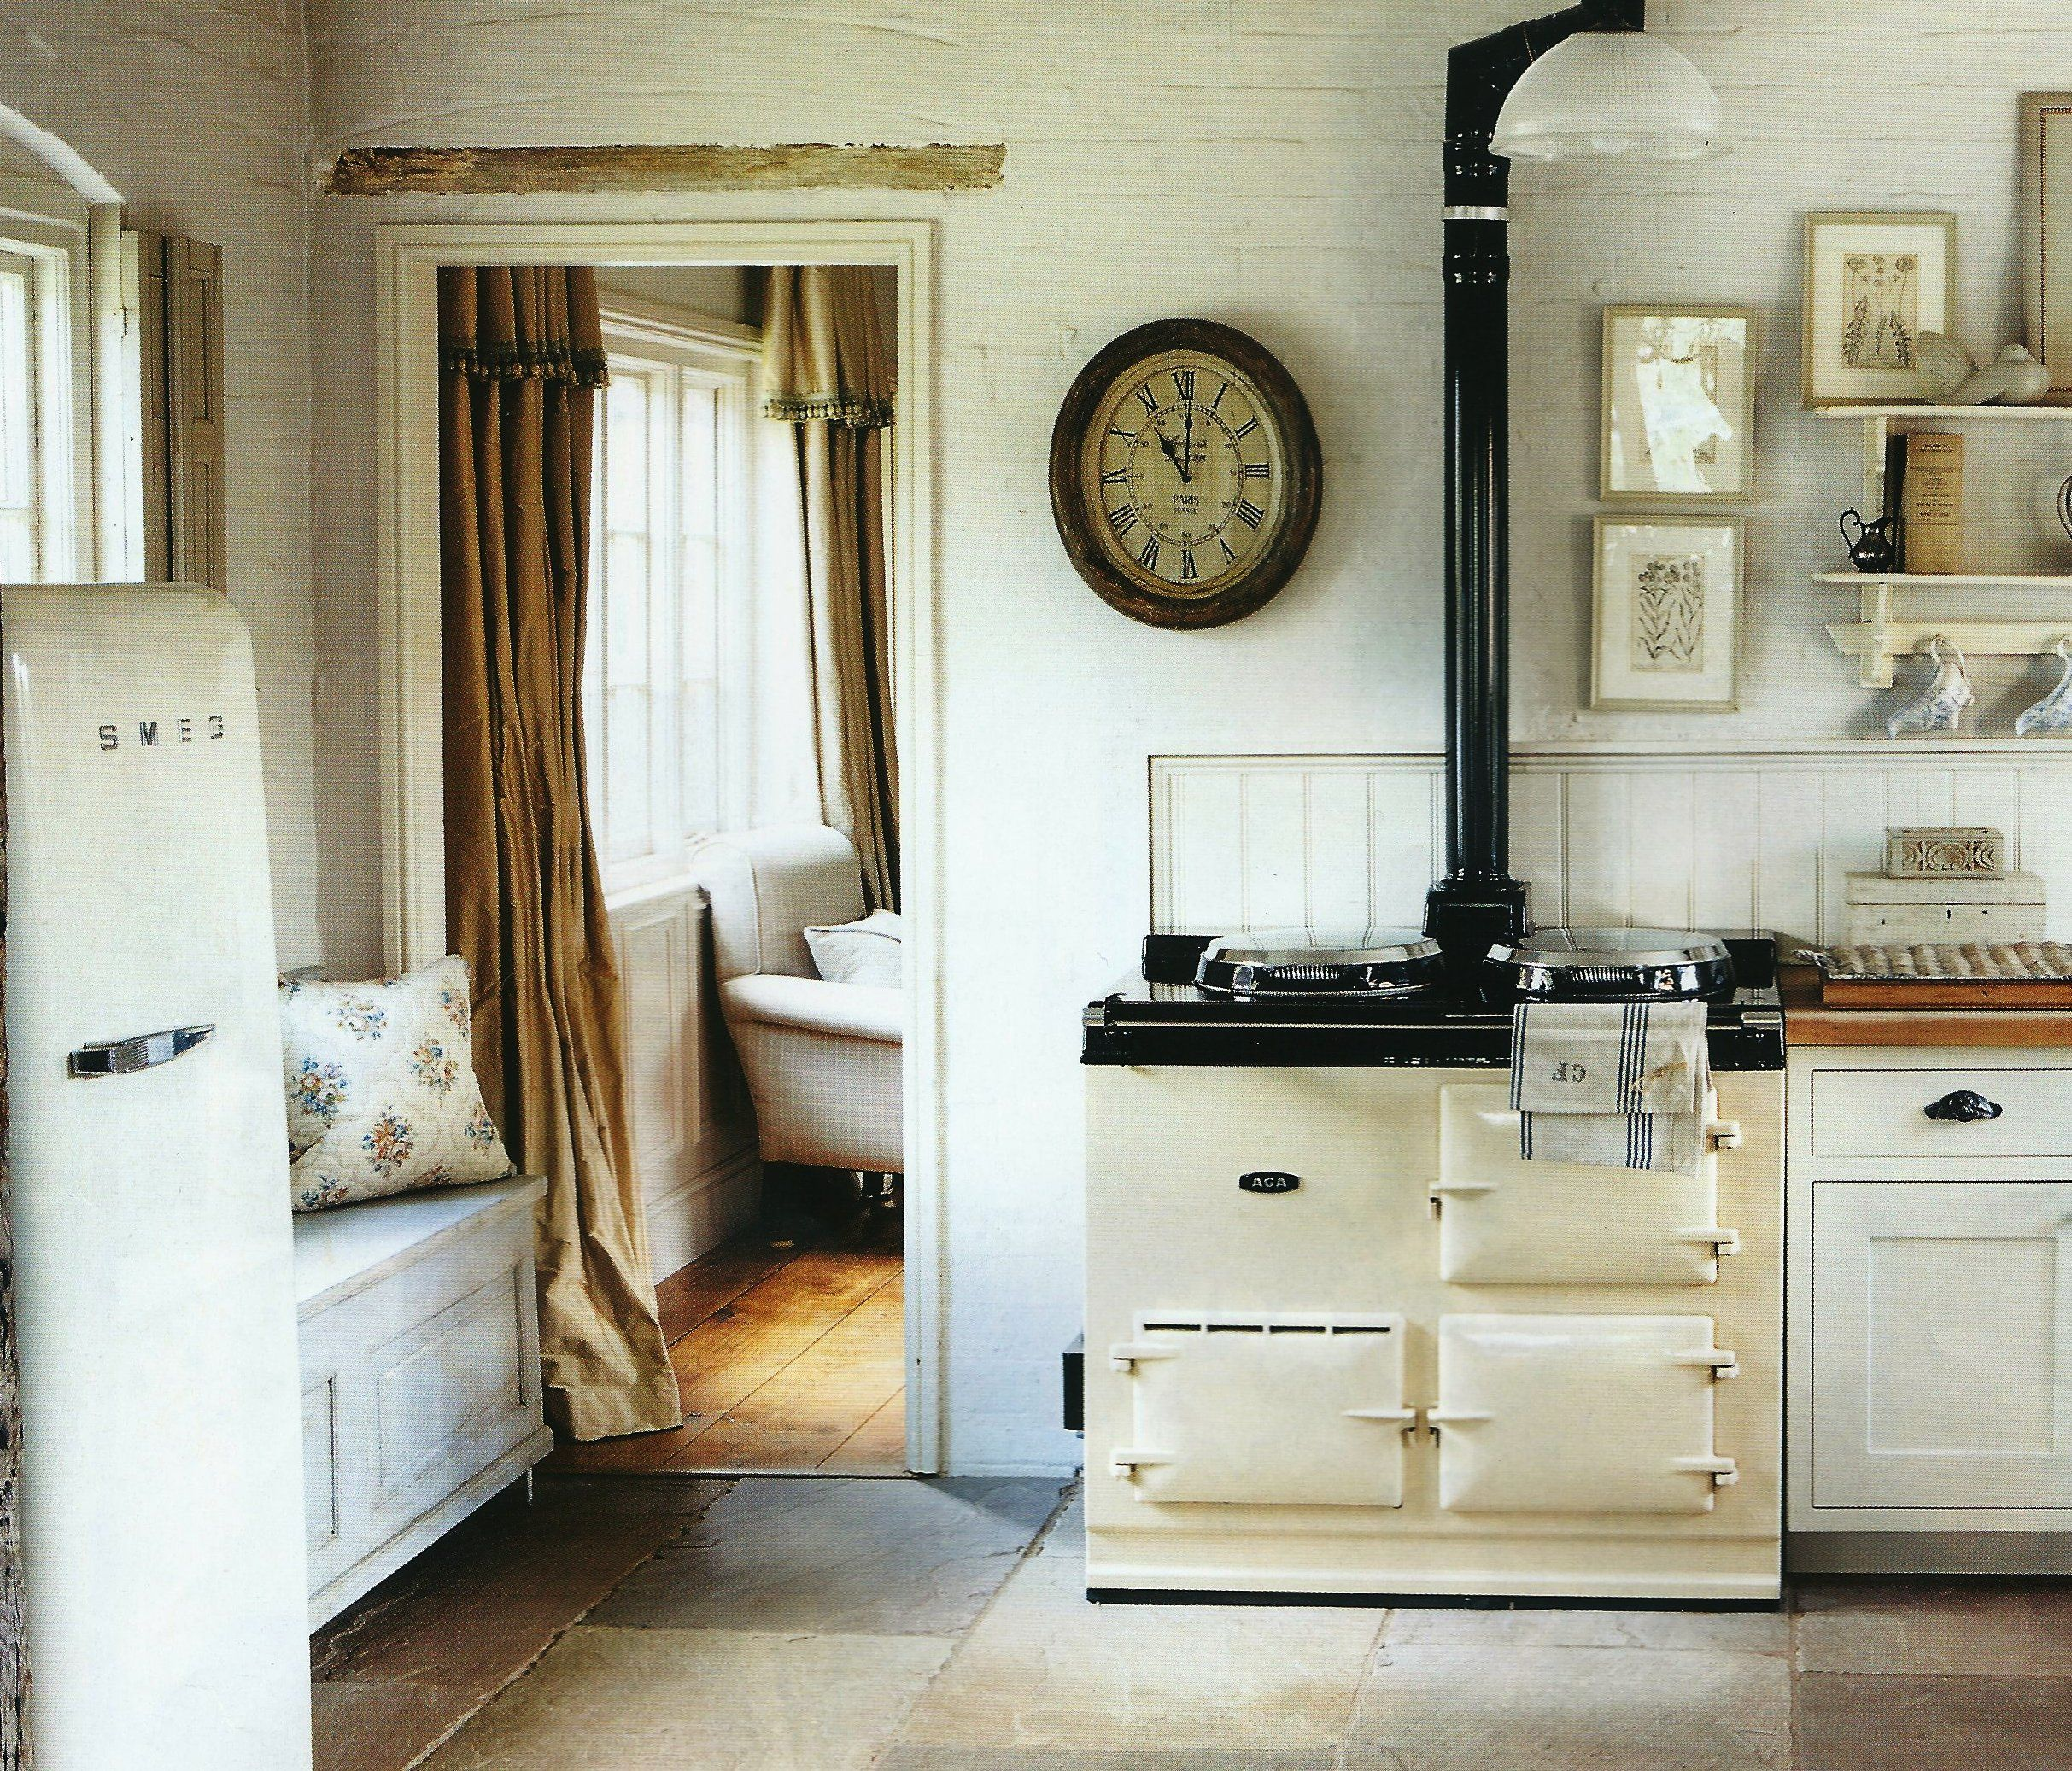 AGA Stove, SMEG Fridge, Soothing Cream-colored Kitchen